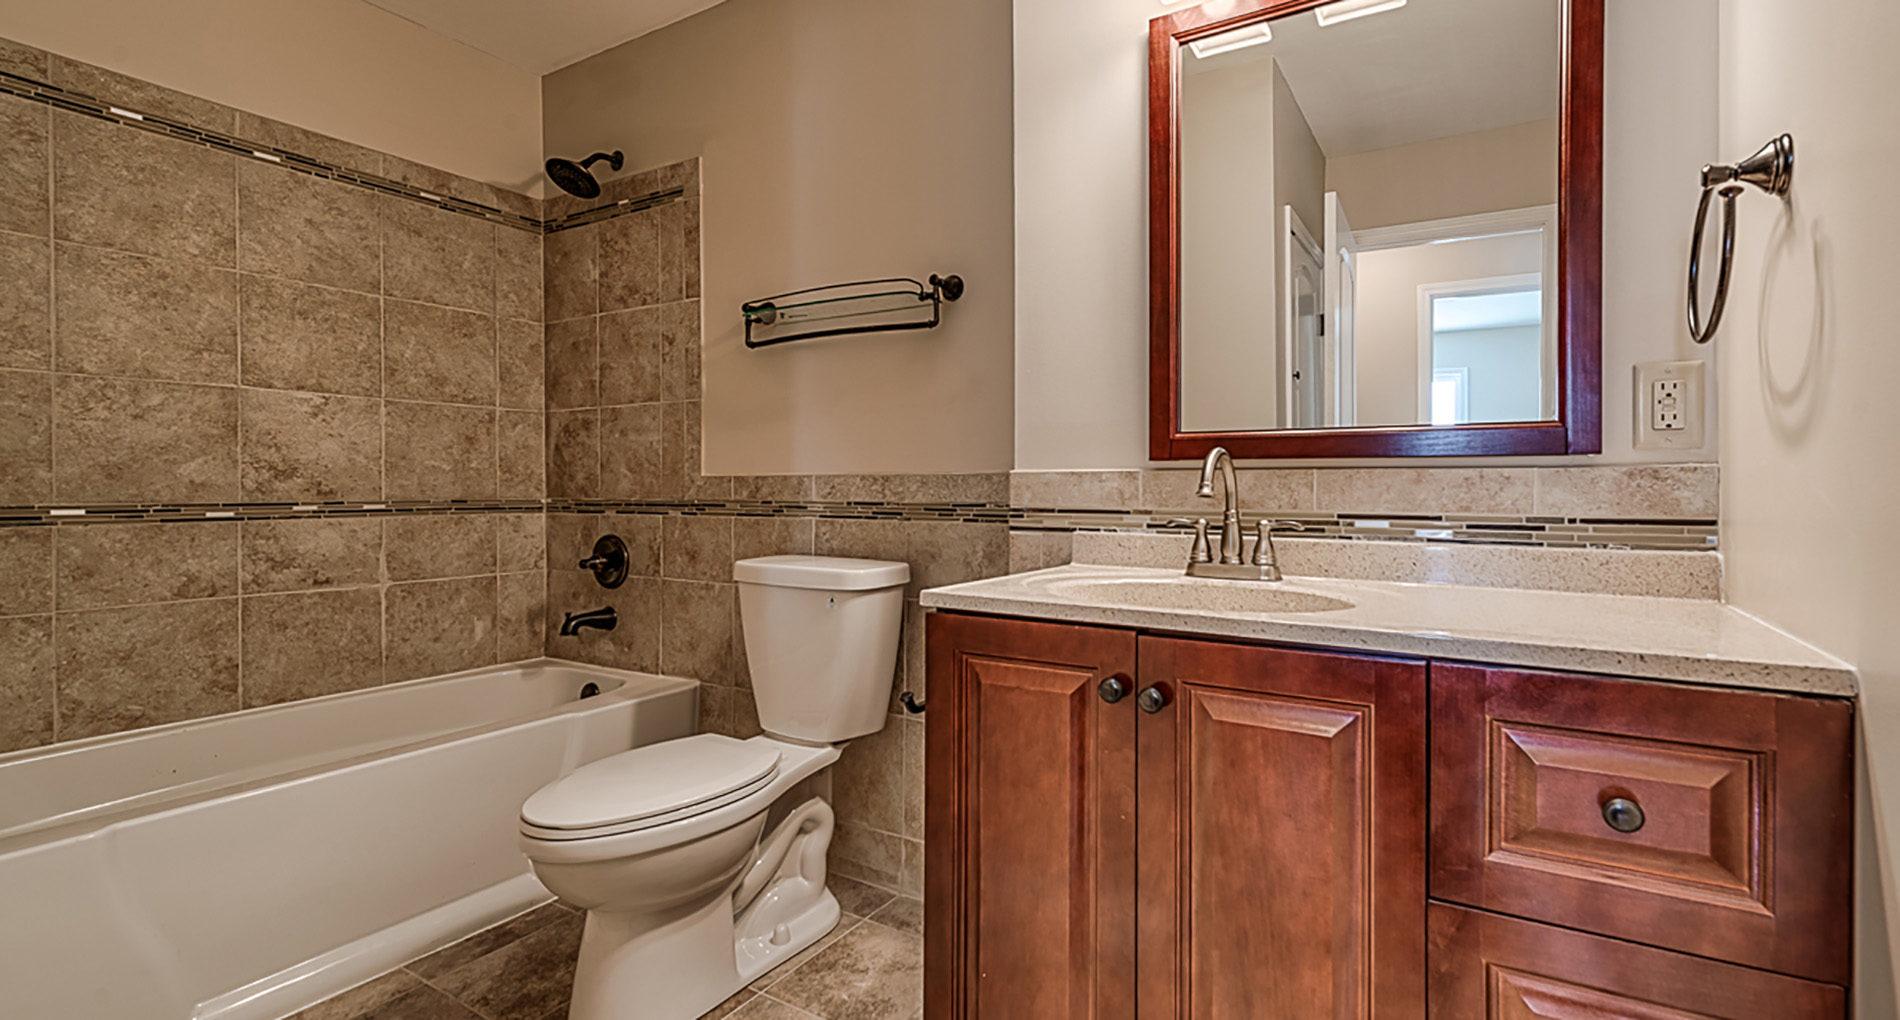 Merveilleux Moncoeur. Bathroom